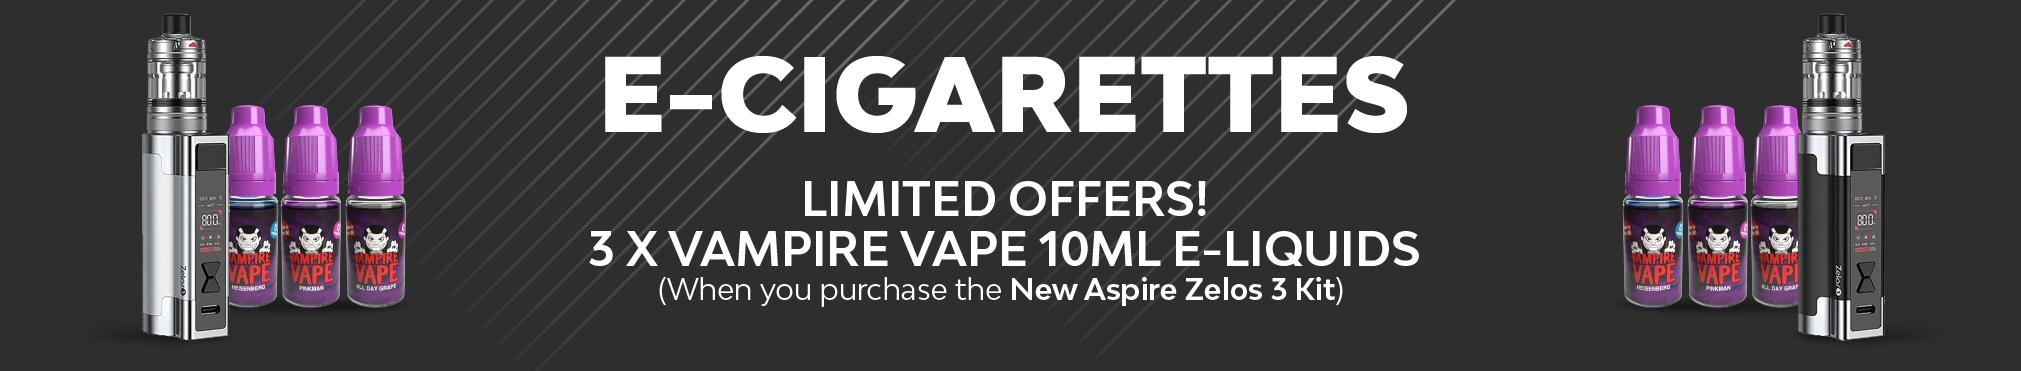 E-Cigarette Kits